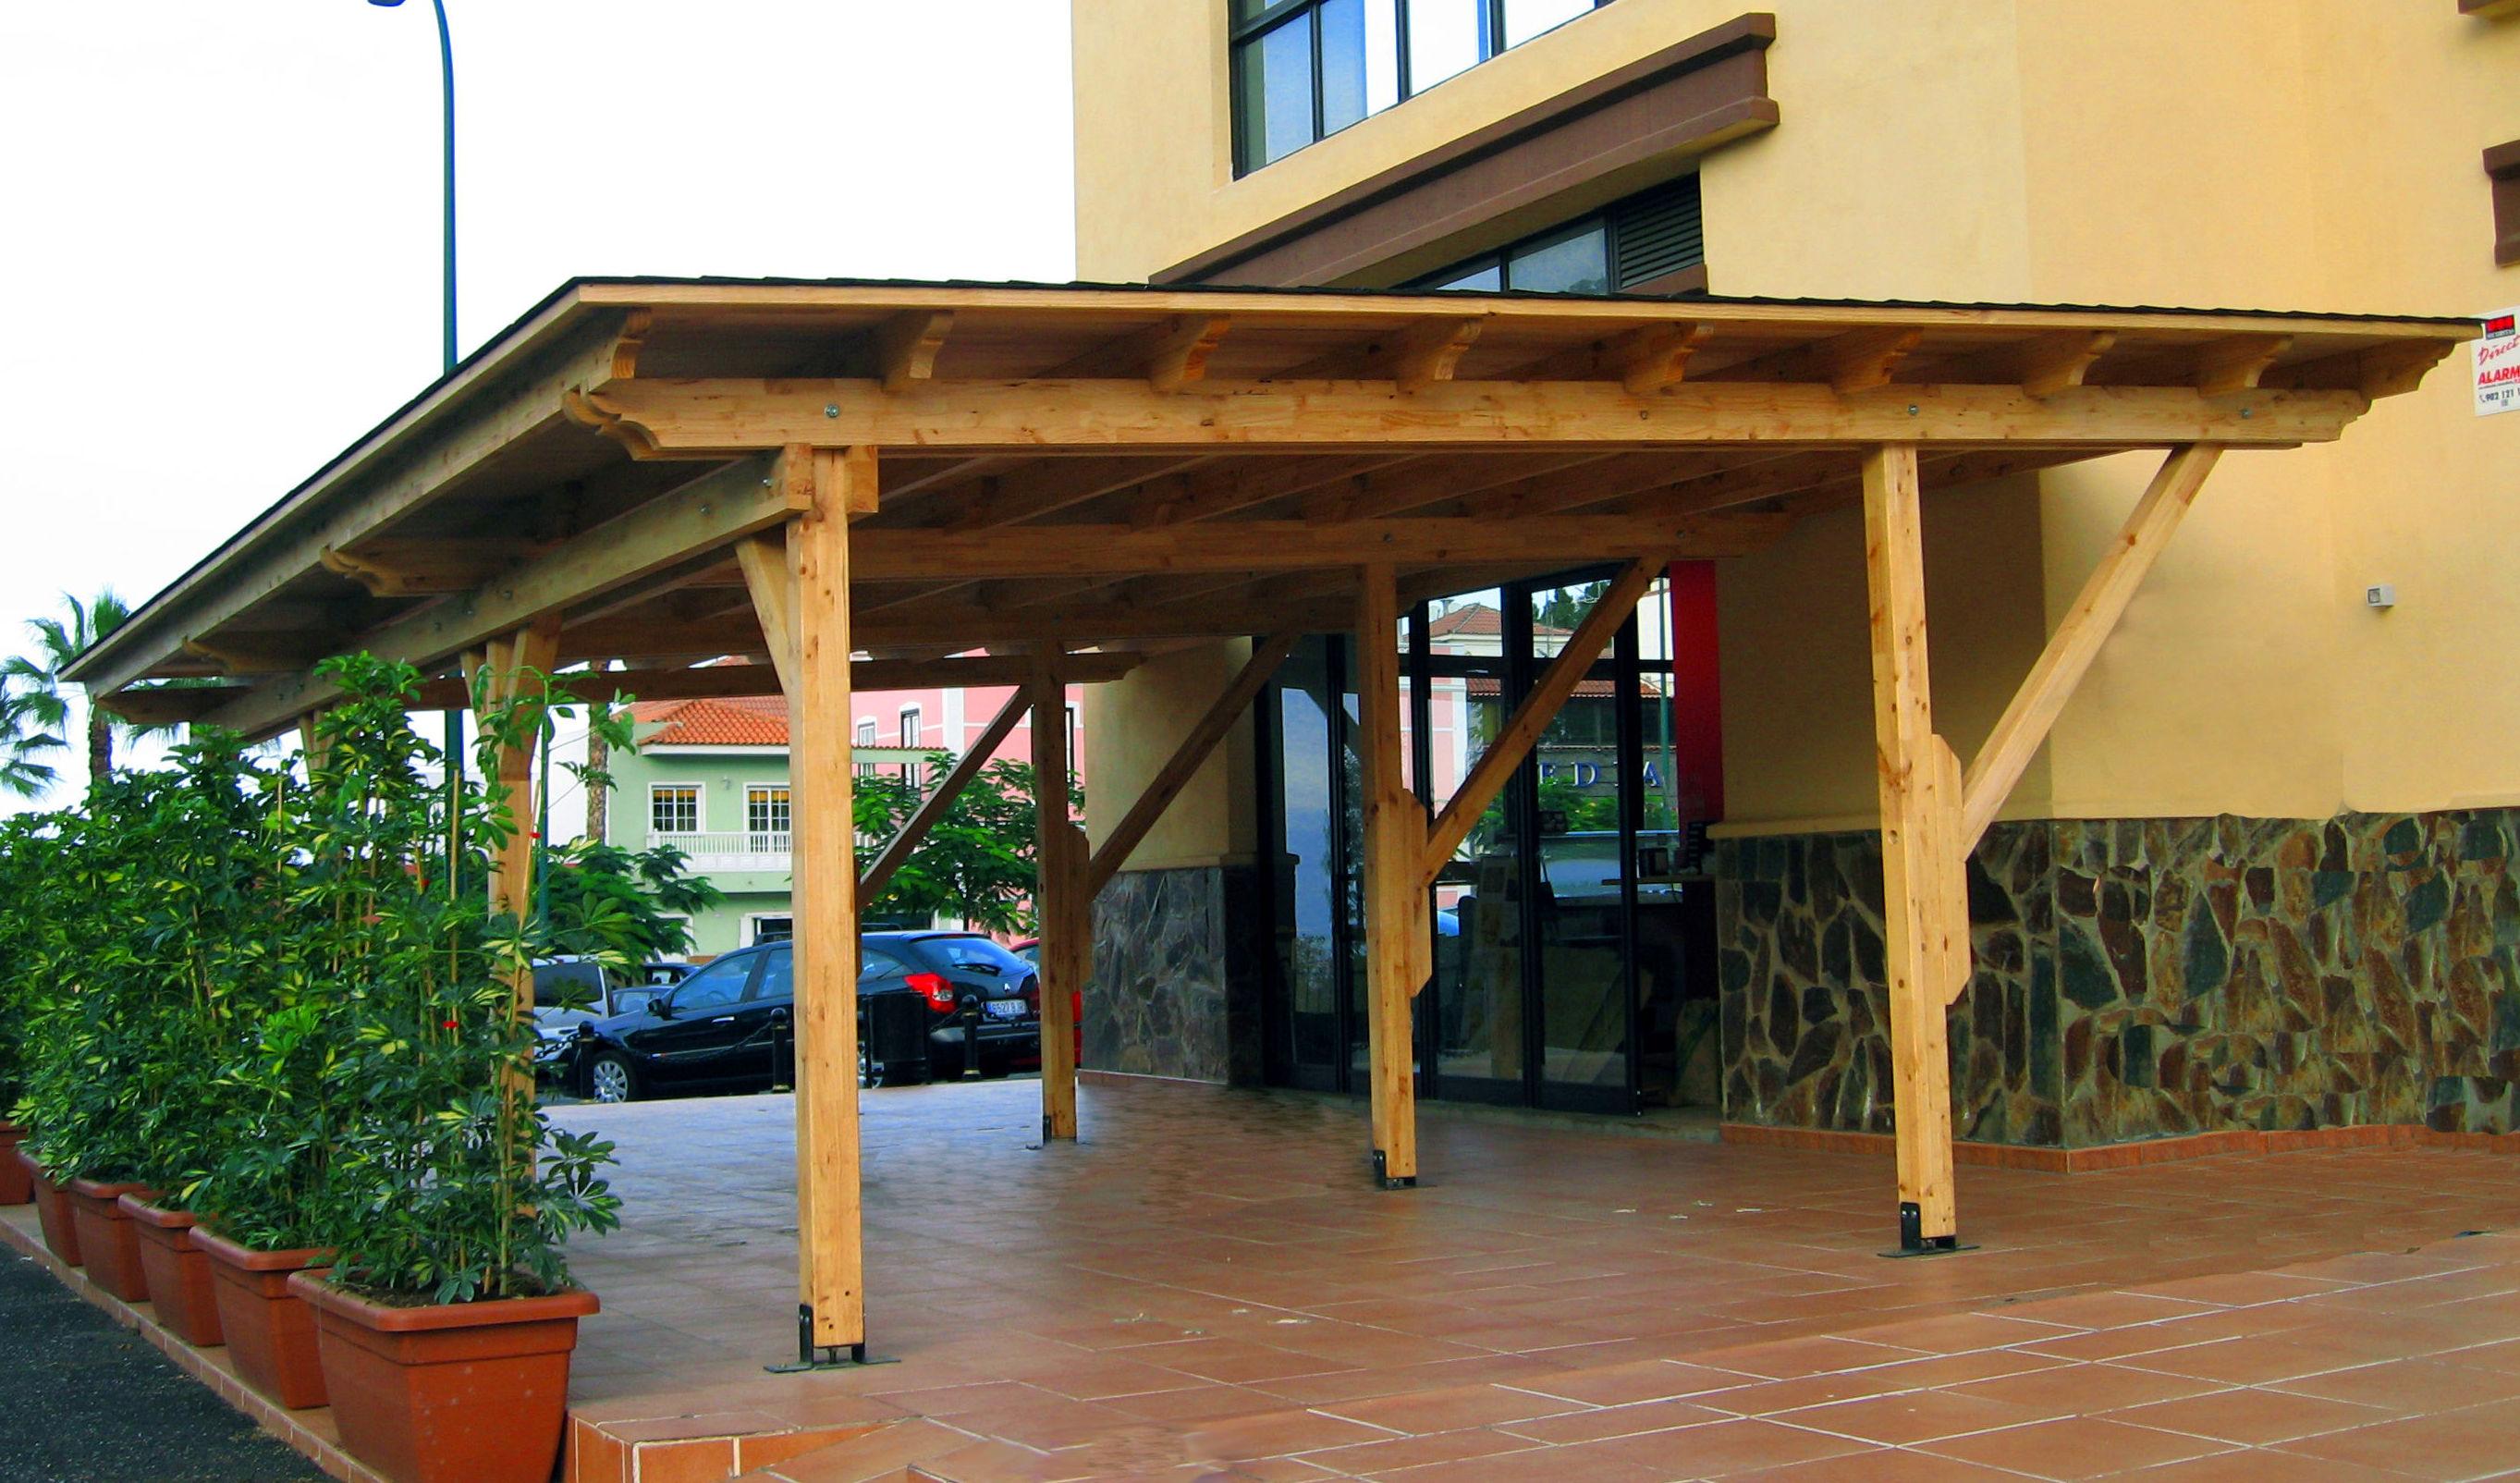 Garaje modular madera 2 plazas Cortelima